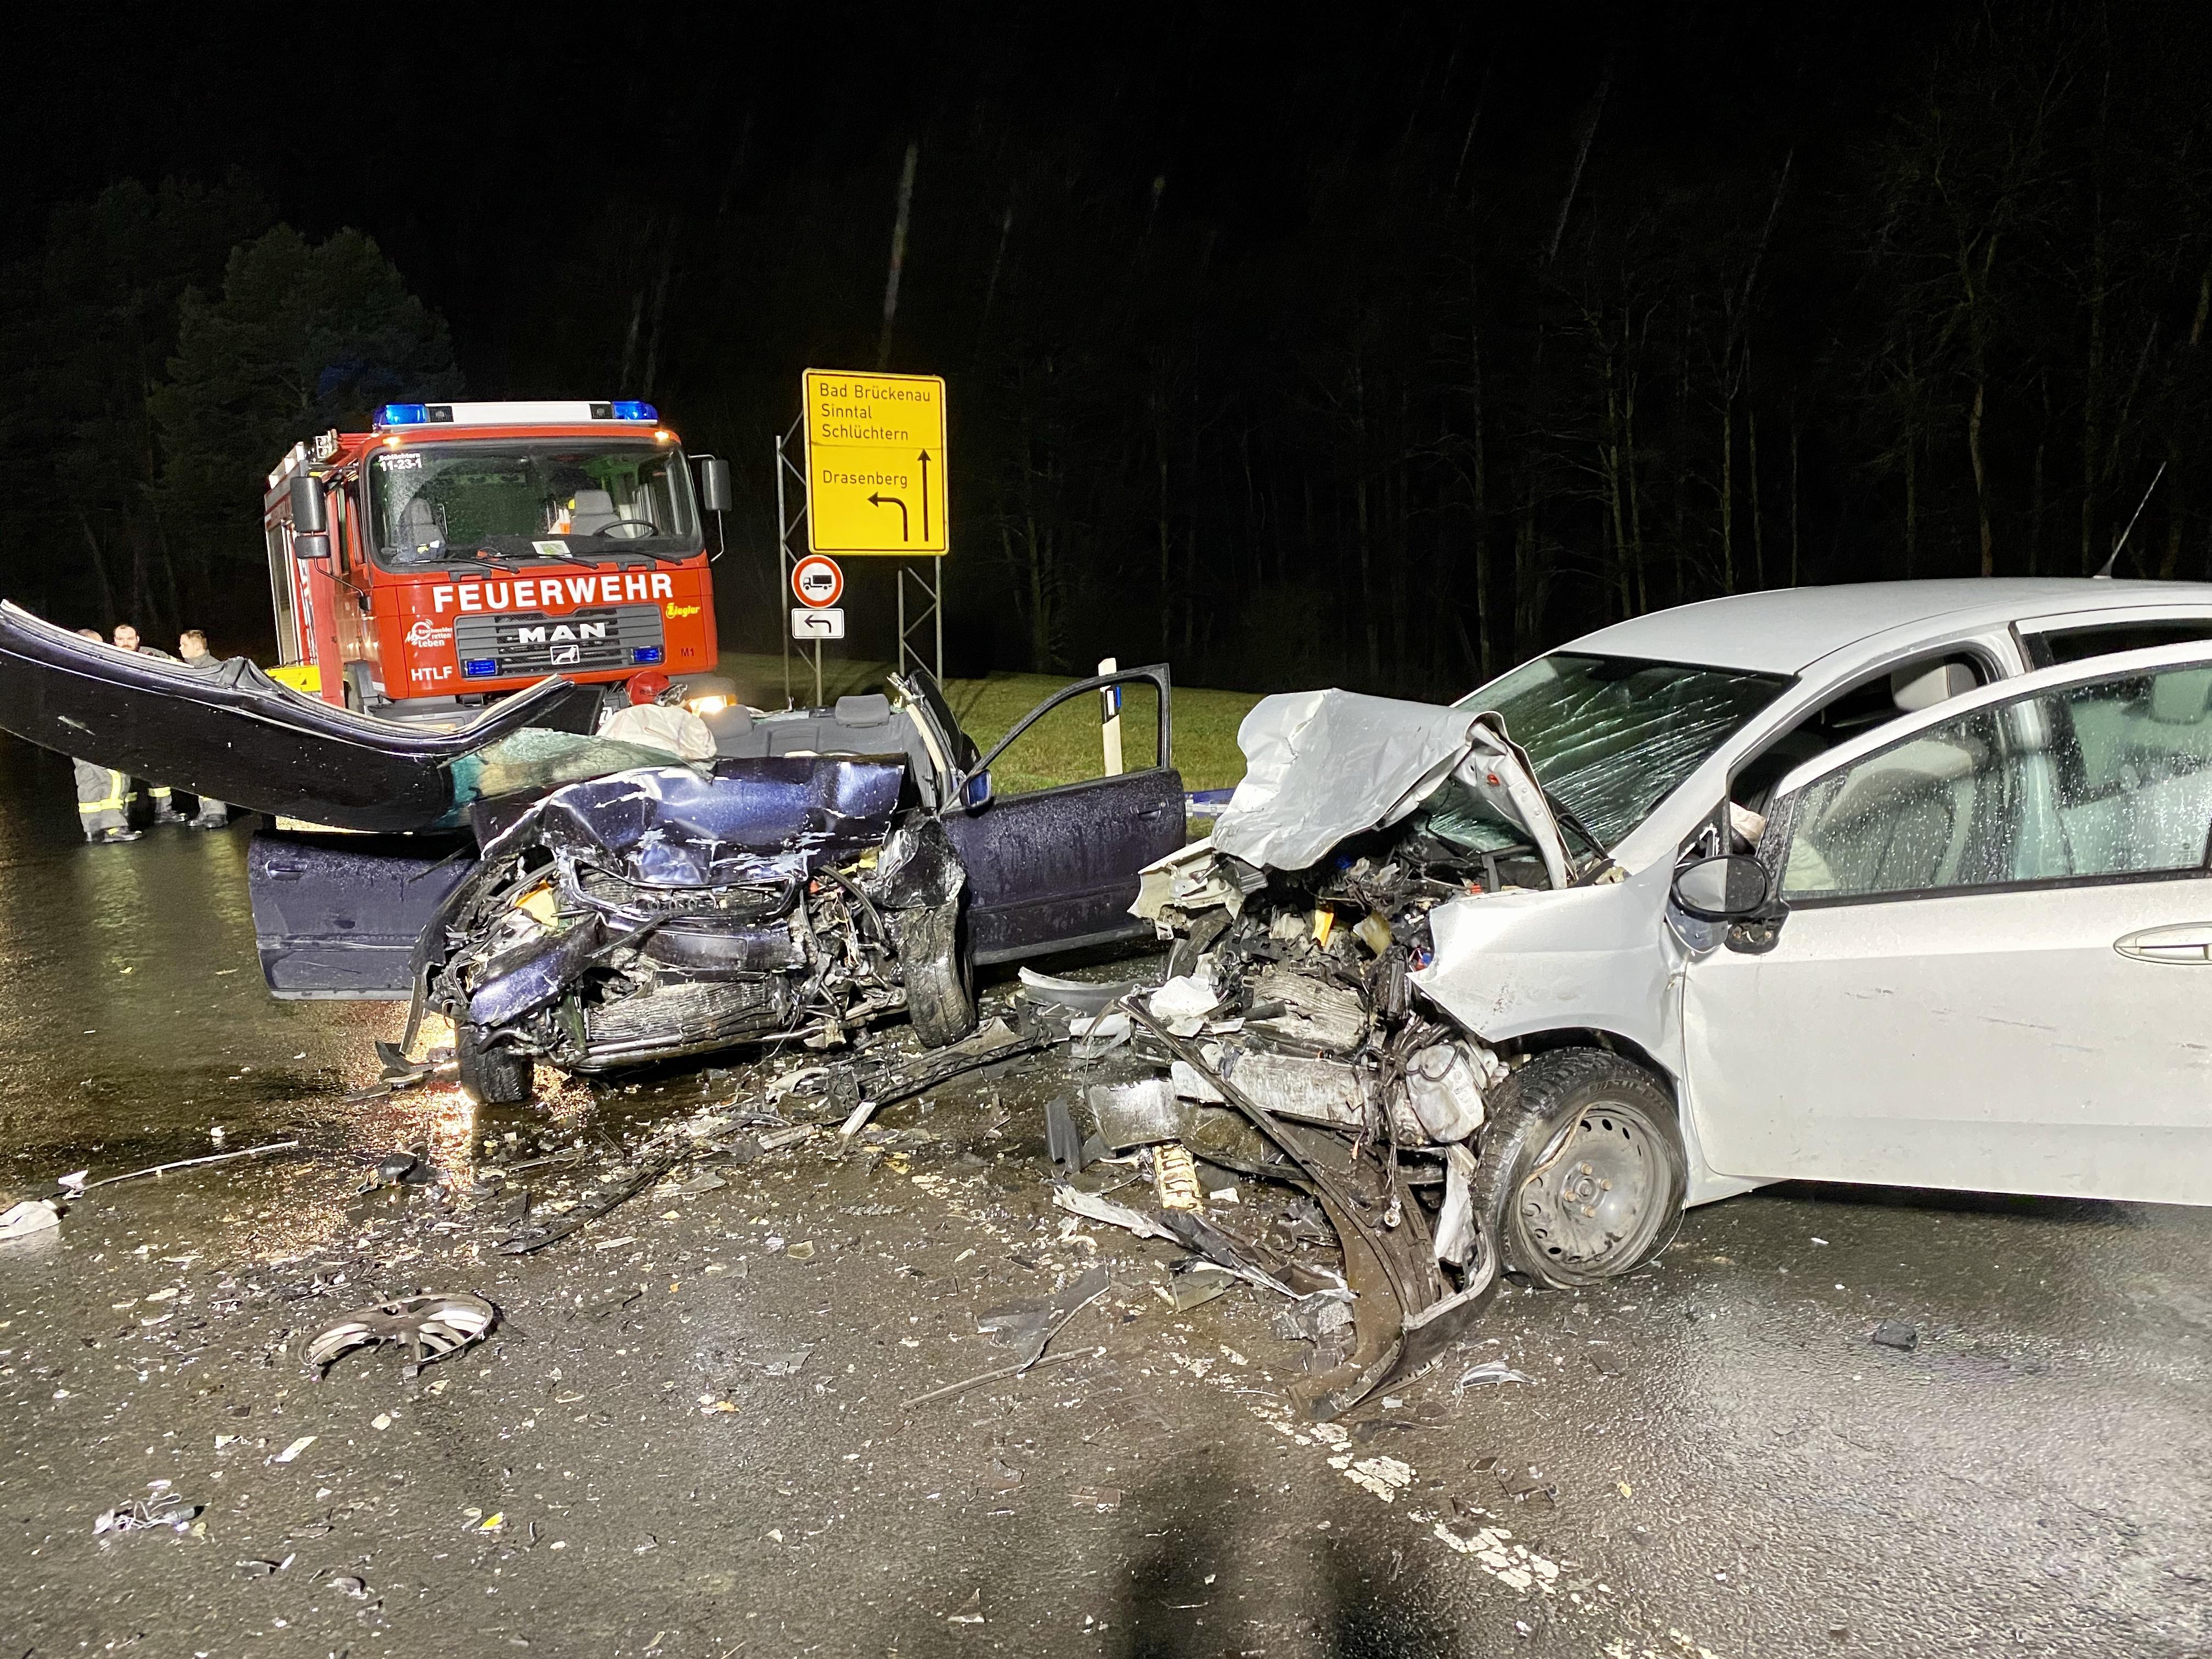 2020-12: 02.02.2020 19:53 Uhr – Verkehrsunfall eingeklemmte Person